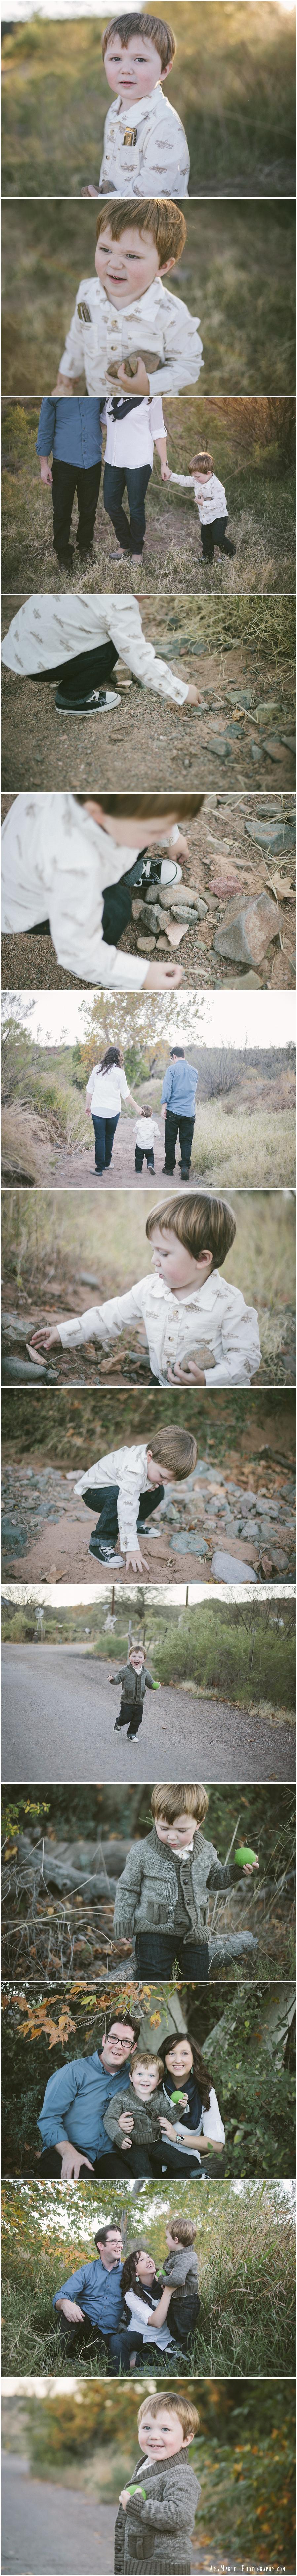 rocks_boy_payson_family_photographer.jpg